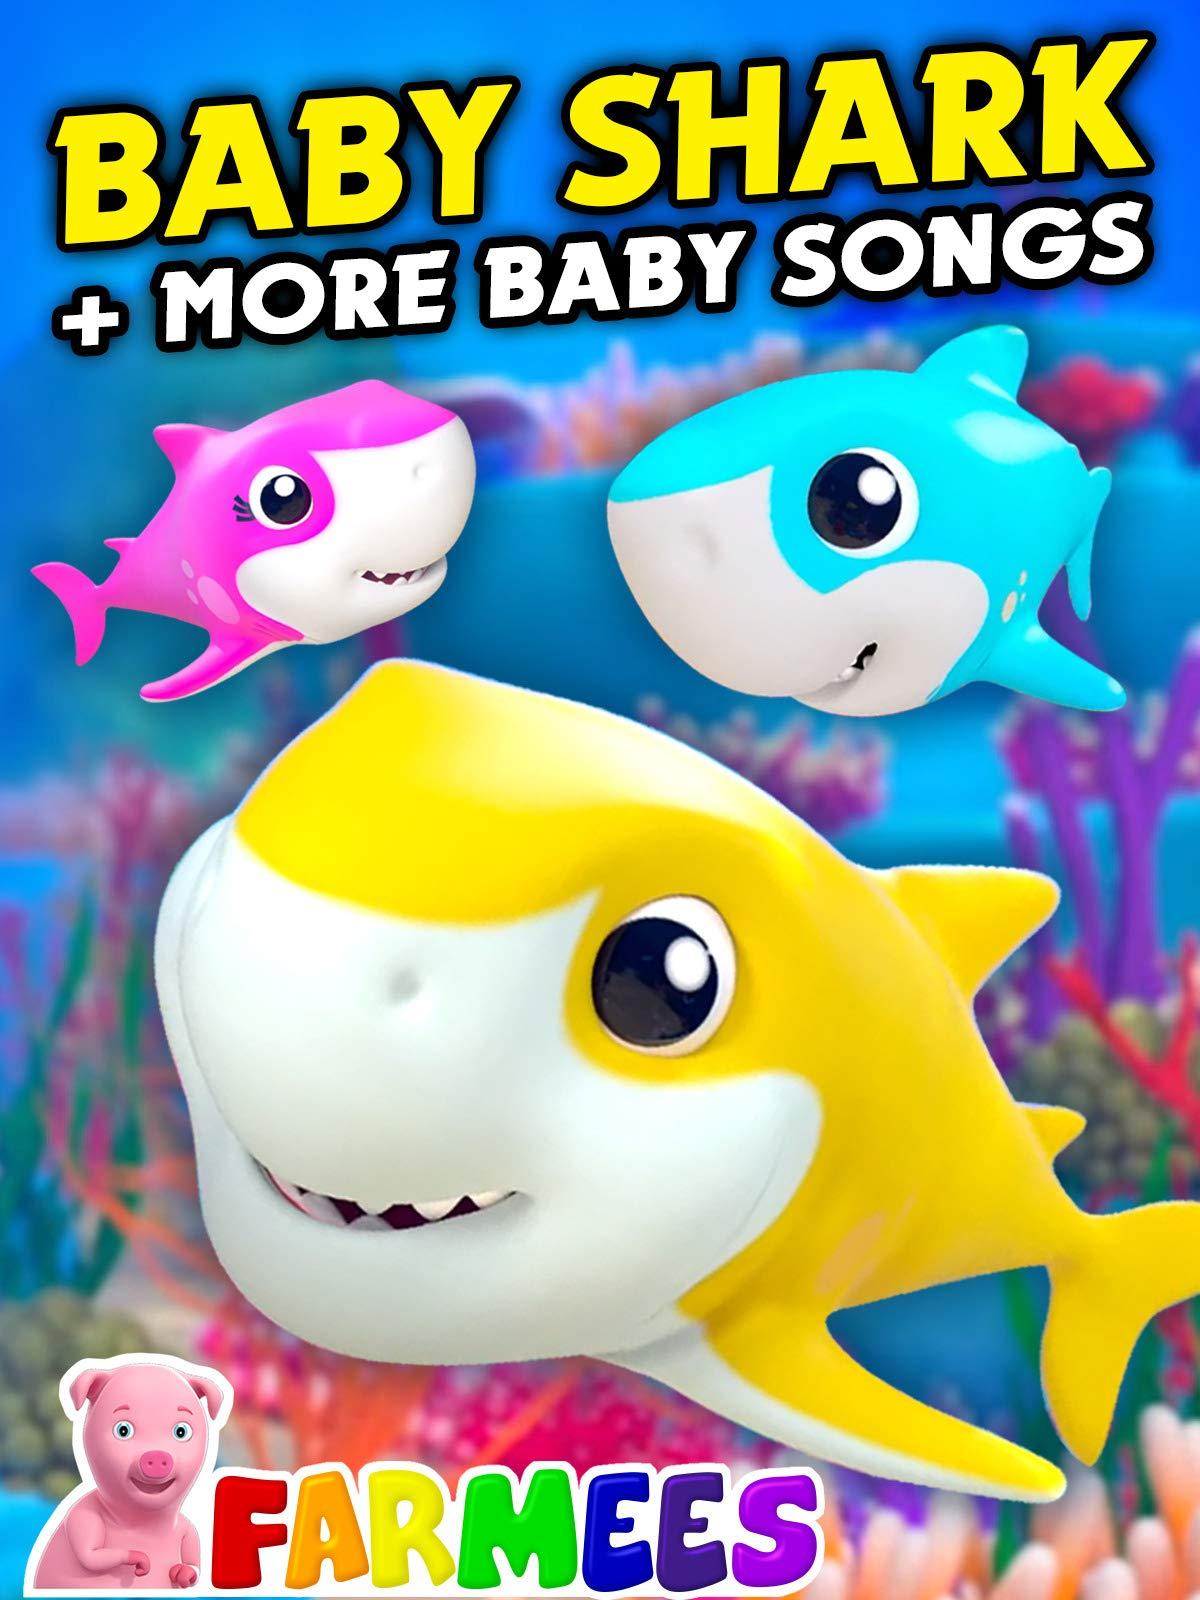 Baby Shark + More Baby Songs - Farmees